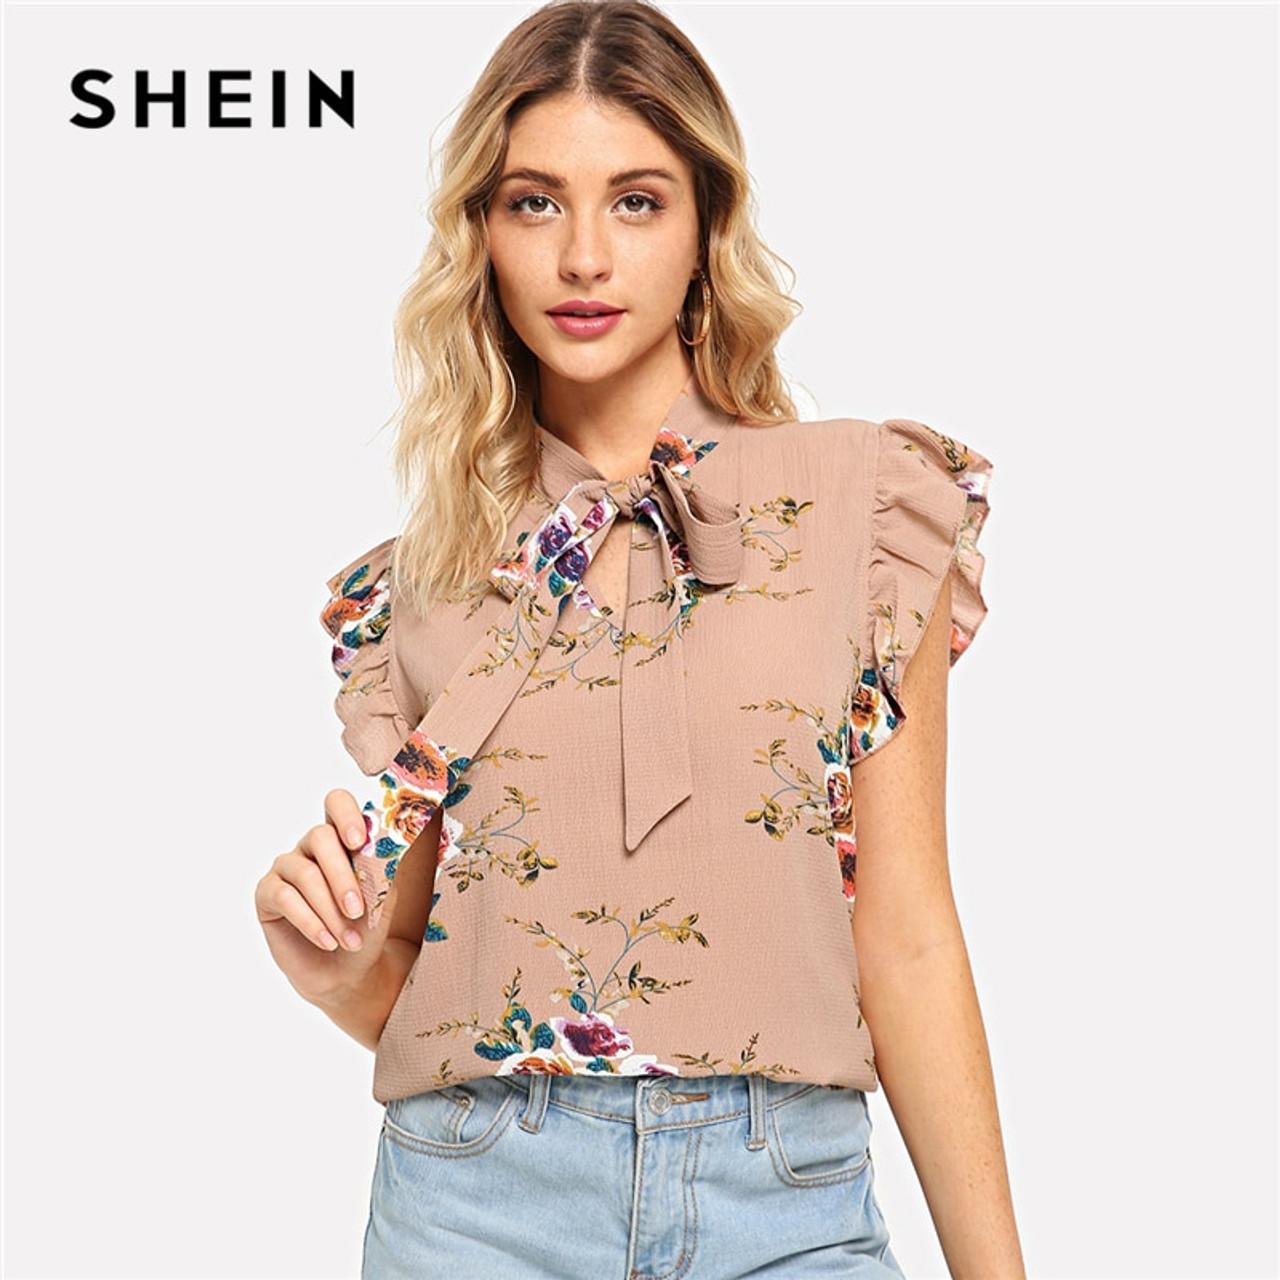 6a341e5ad38 SHEIN Flounce Shoulder Tied Neck Floral Blouse Pink Ruffle Sleeveless  Chiffon Blouses Women Summer Casual Elegant Tops - OnshopDeals.Com